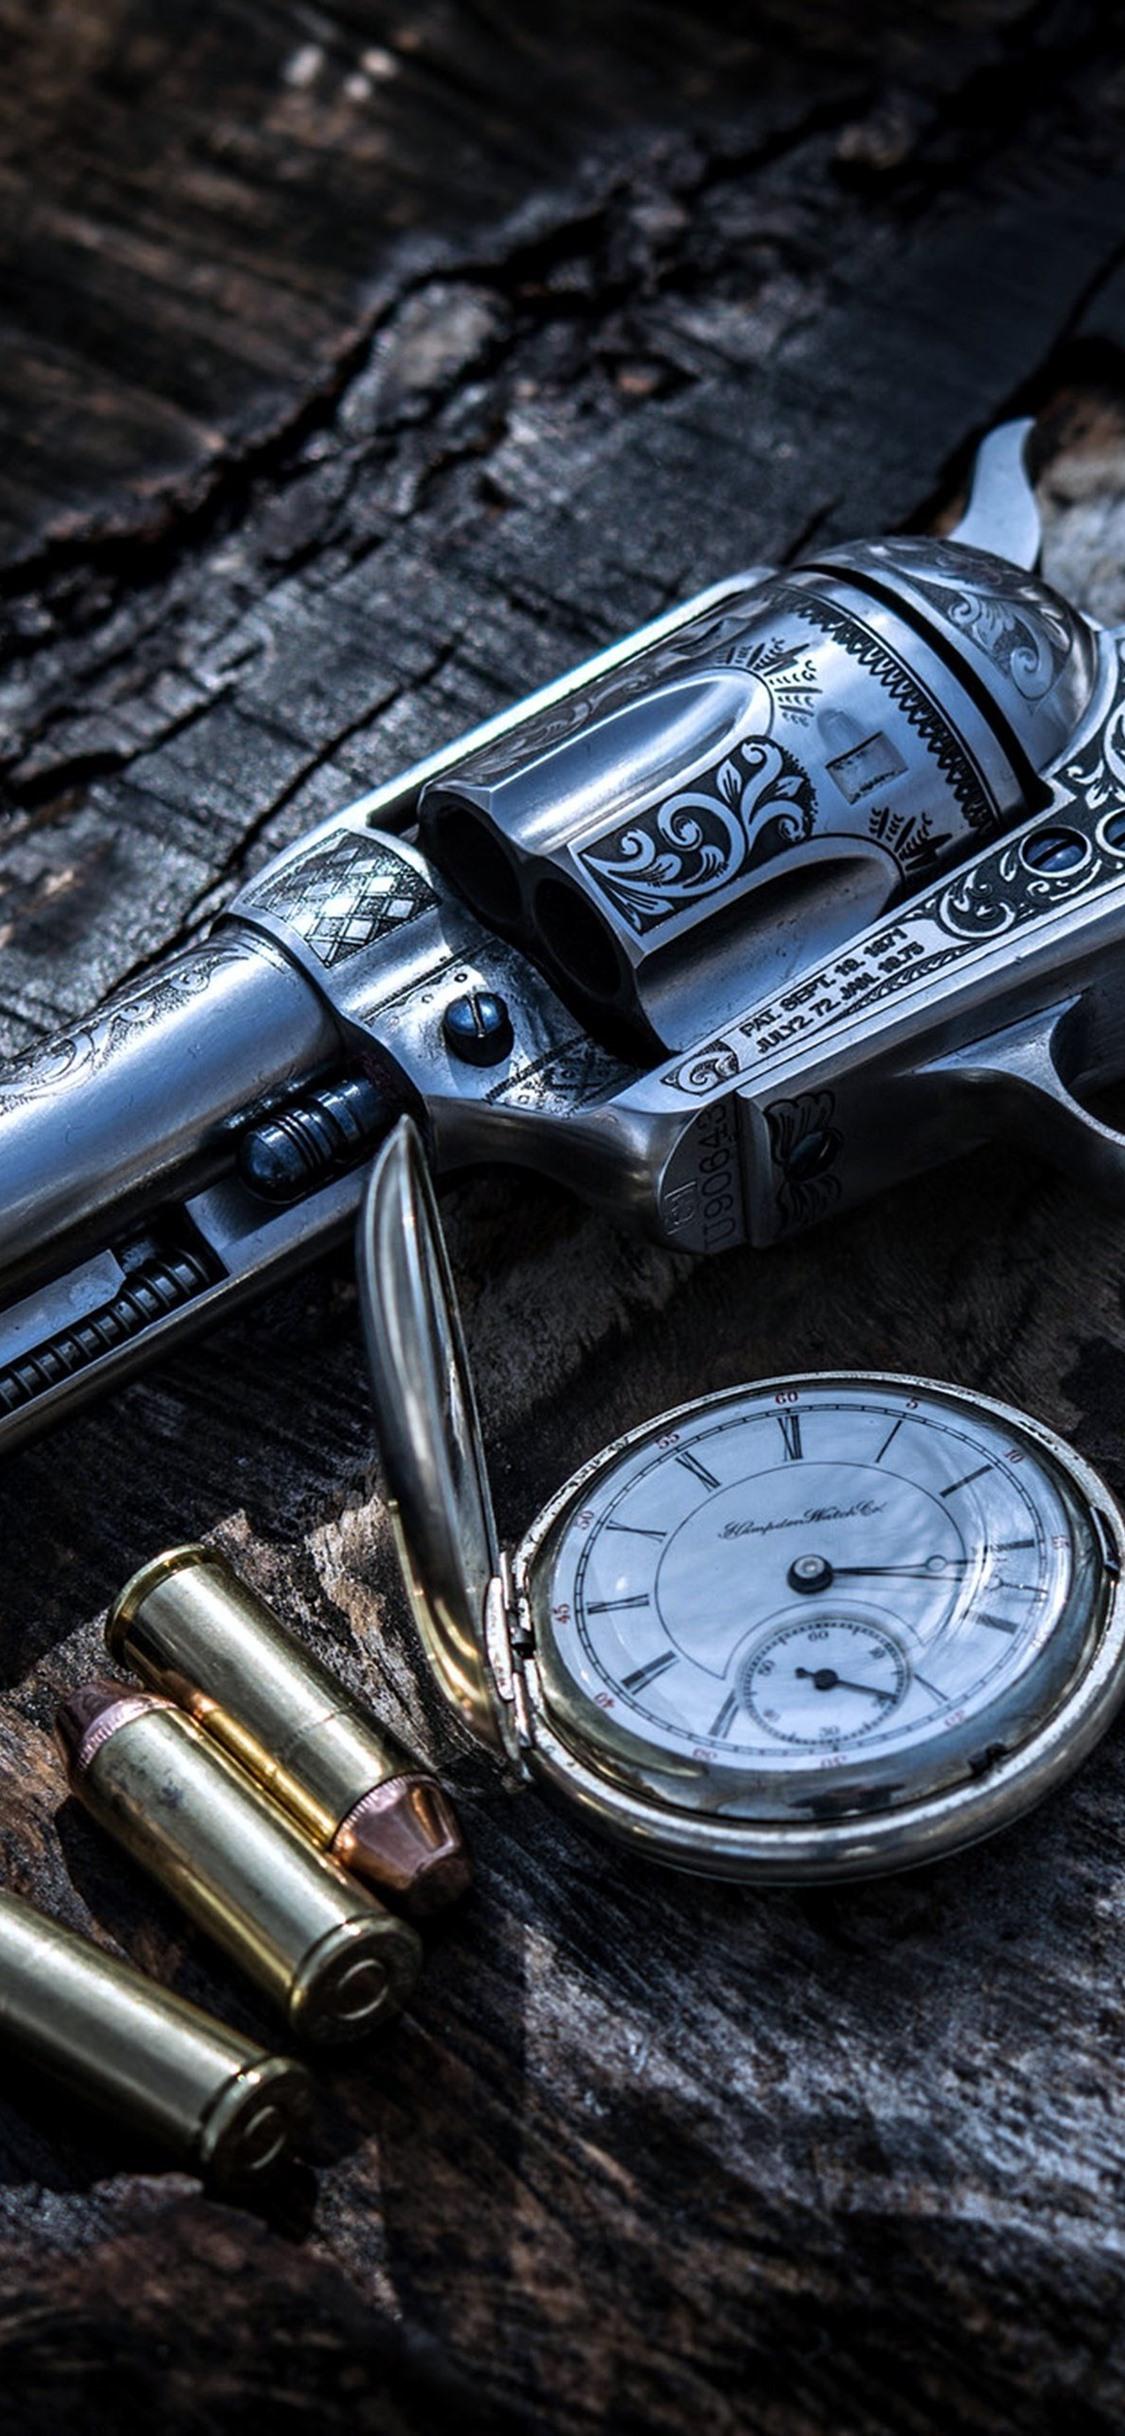 Gun Bullets Weapon Pocket Watch 1125x2436 Iphone Xs X